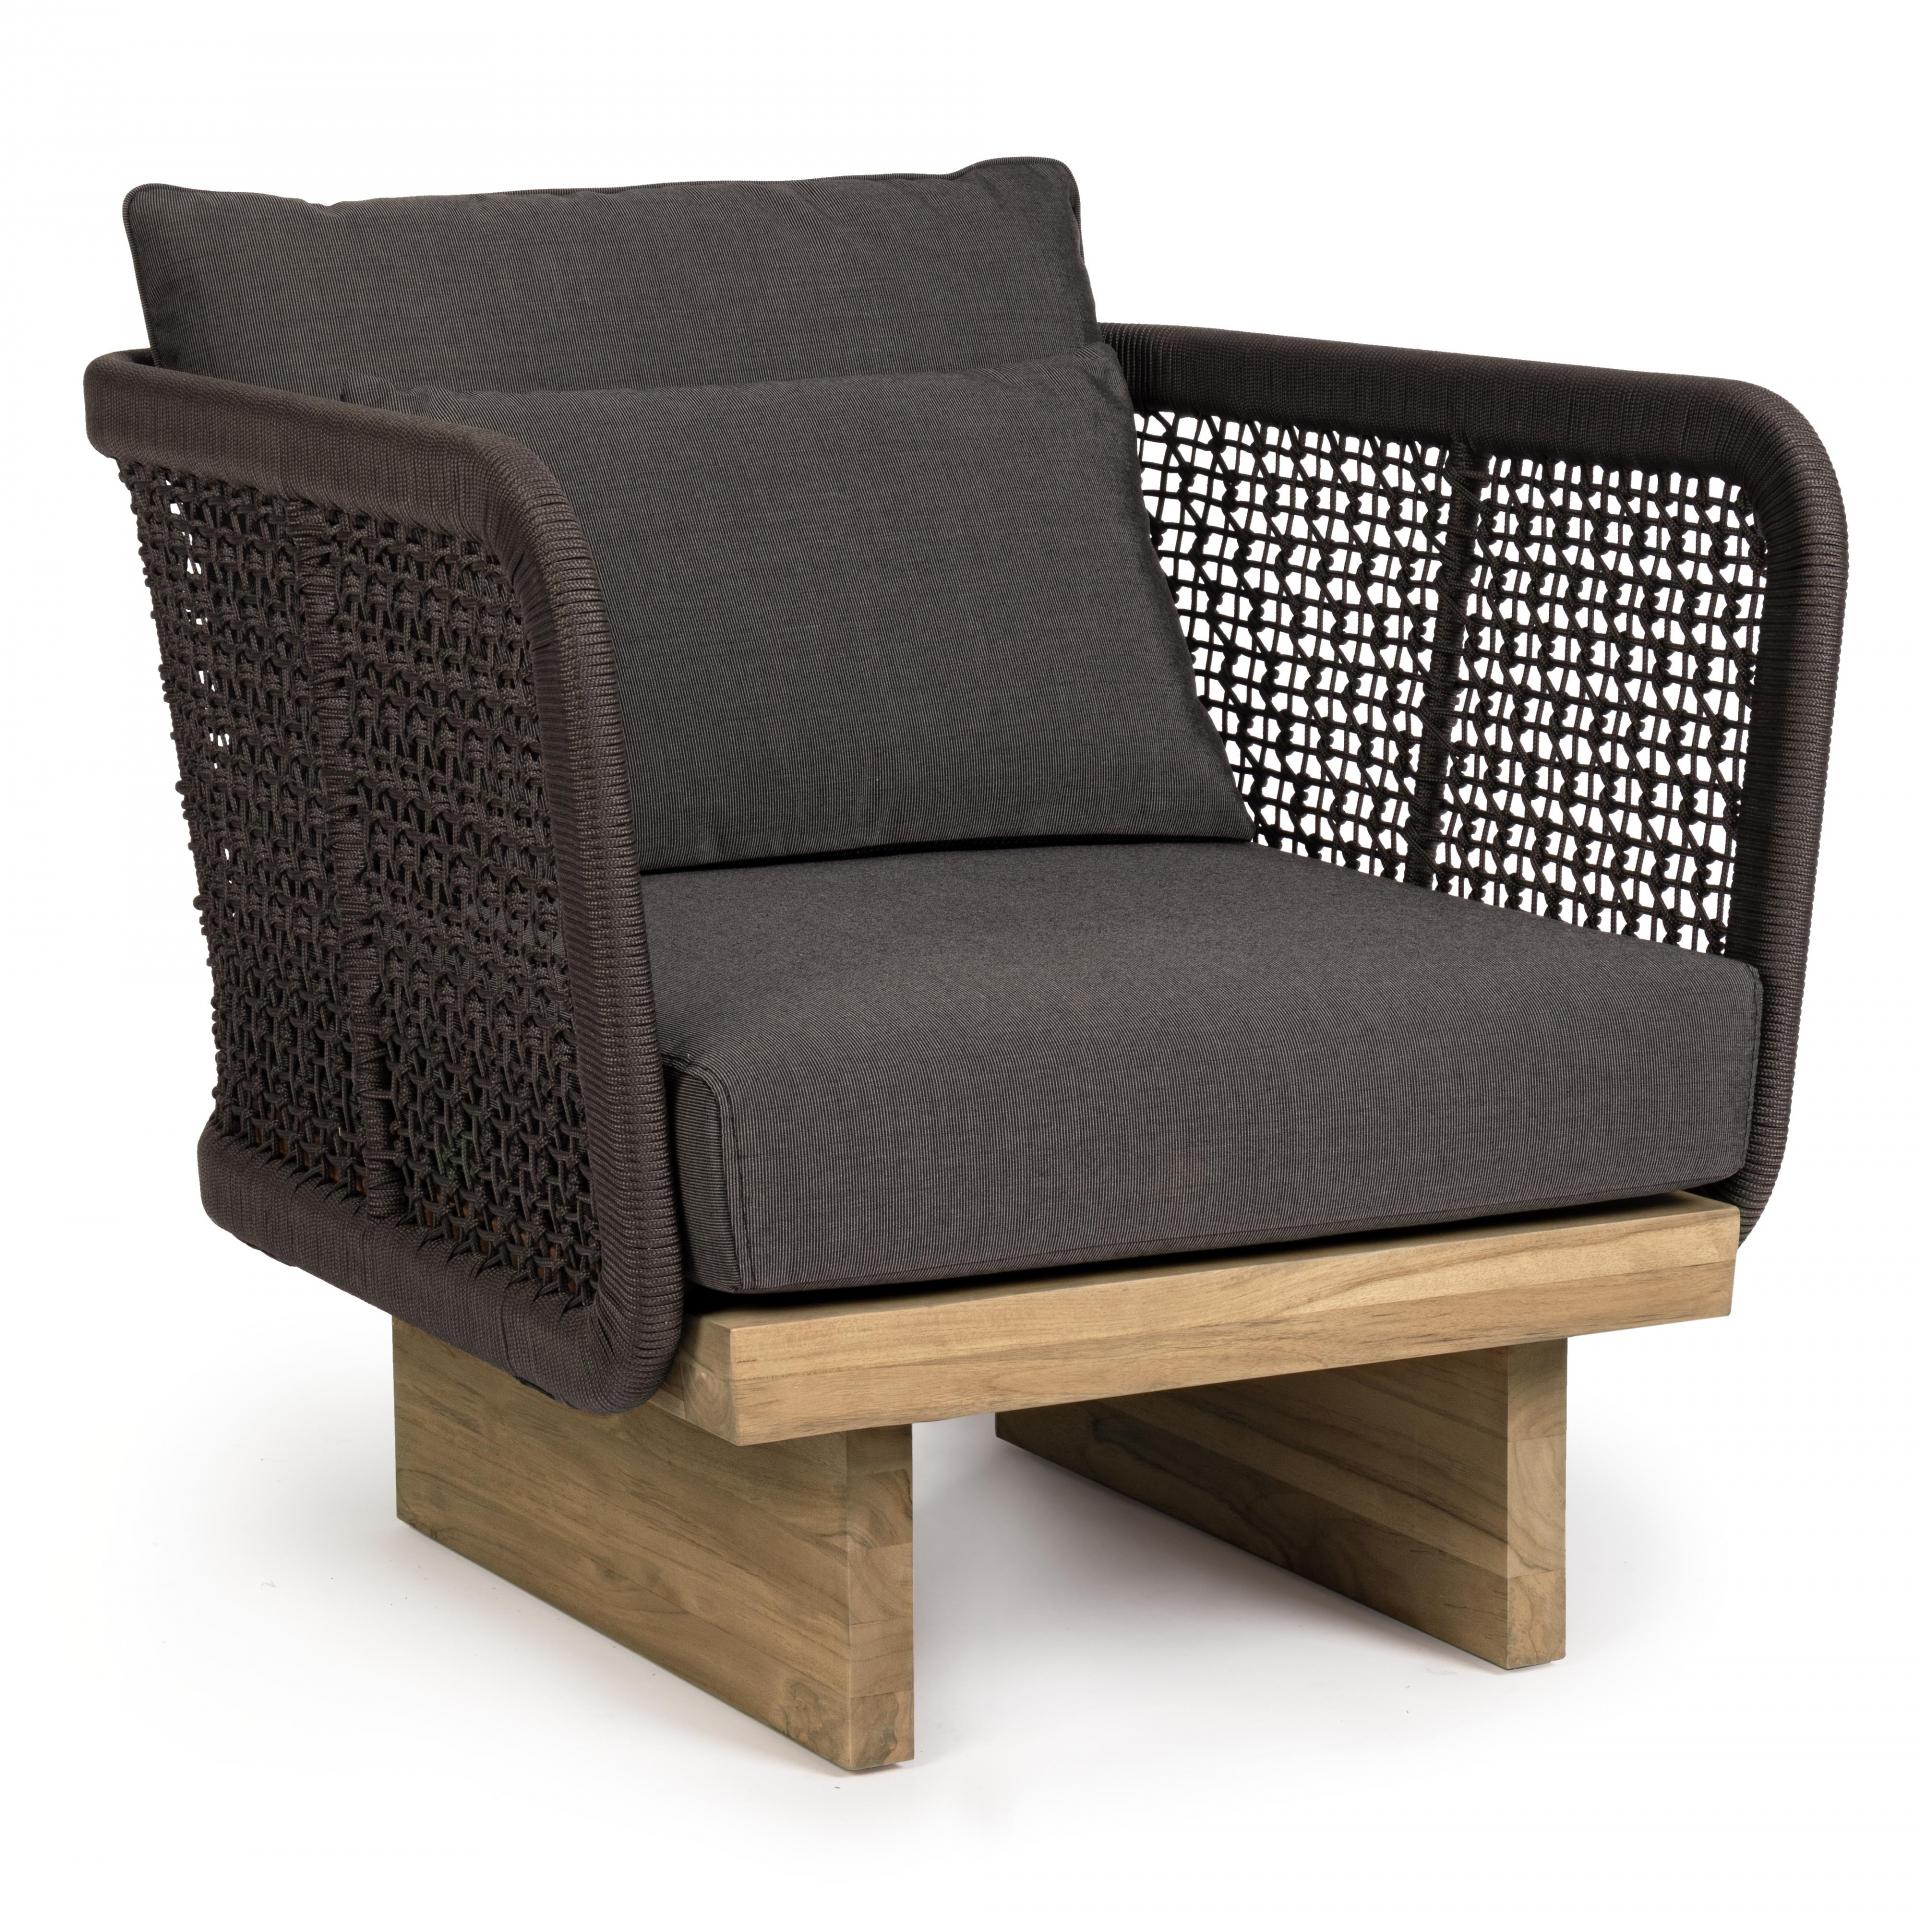 Pop up Home designová křesla Xylia Dark Armchair